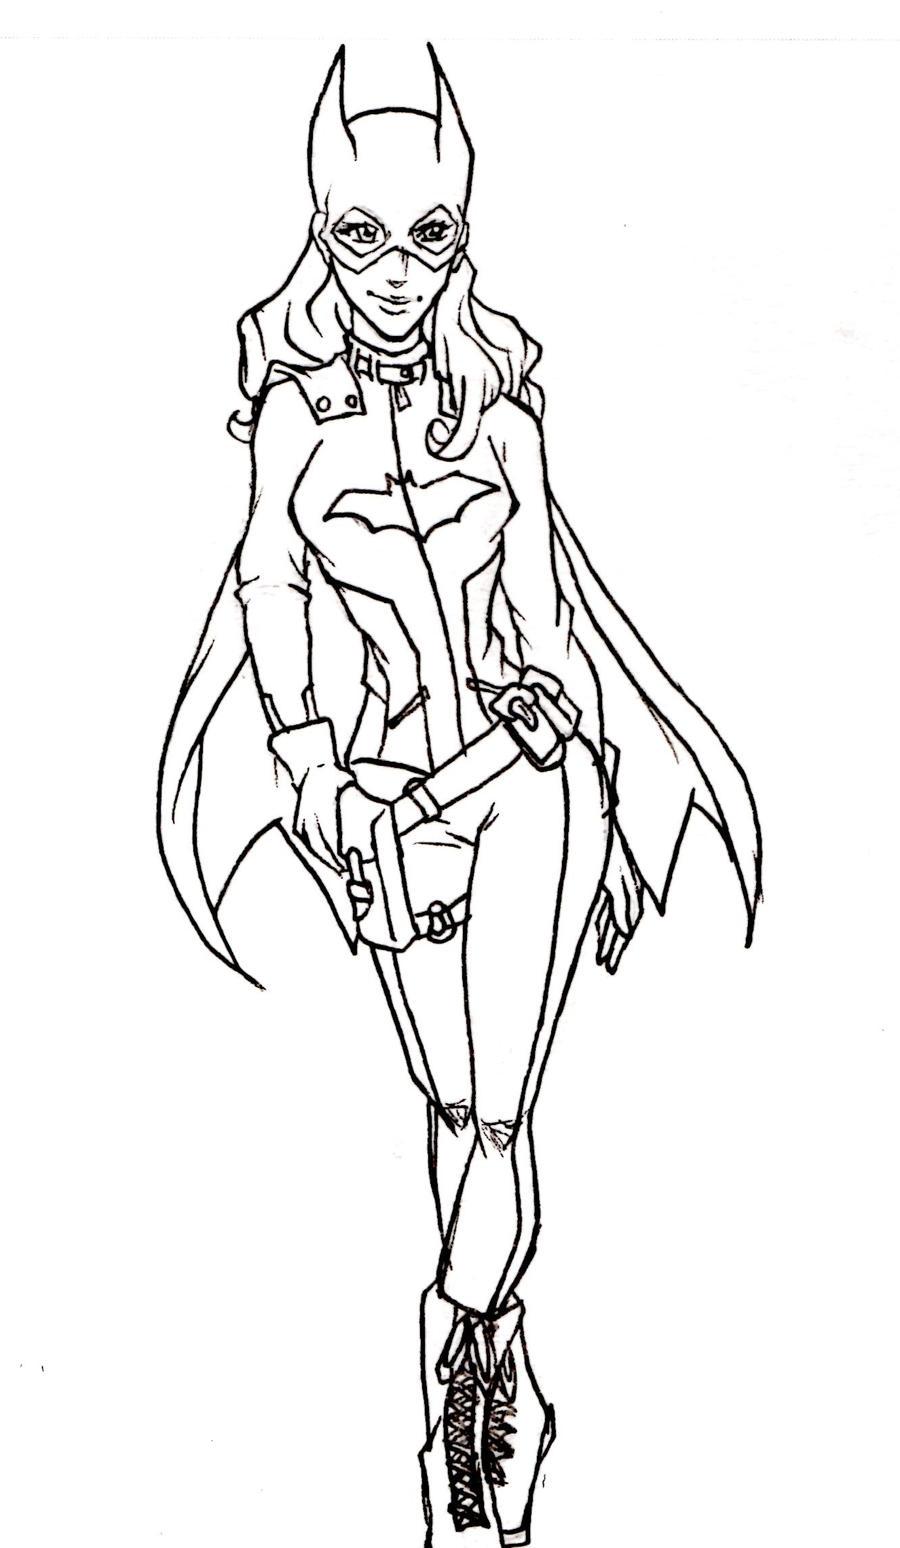 Line Art Comic : Dc comics batgirl by kimberly castello on deviantart